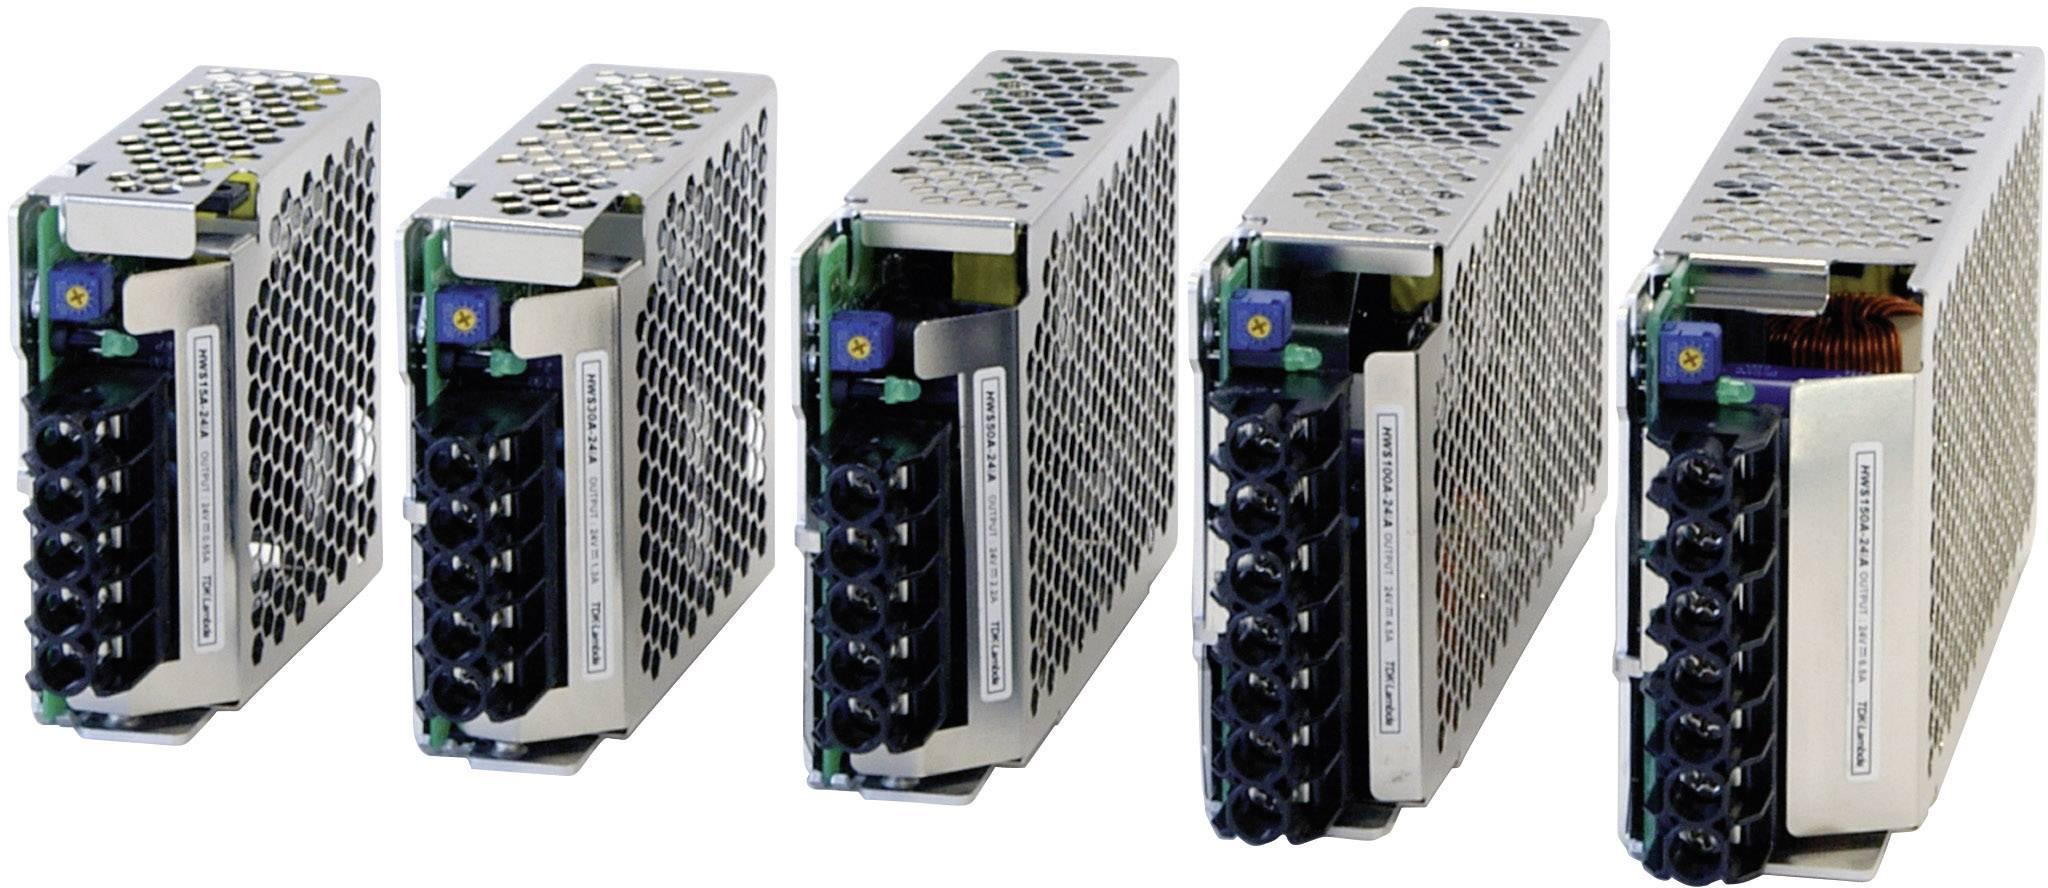 Zabudovateľný napájací zdroj TDK-Lambda HWS-15A-24/A, 24 V, 15,6 W